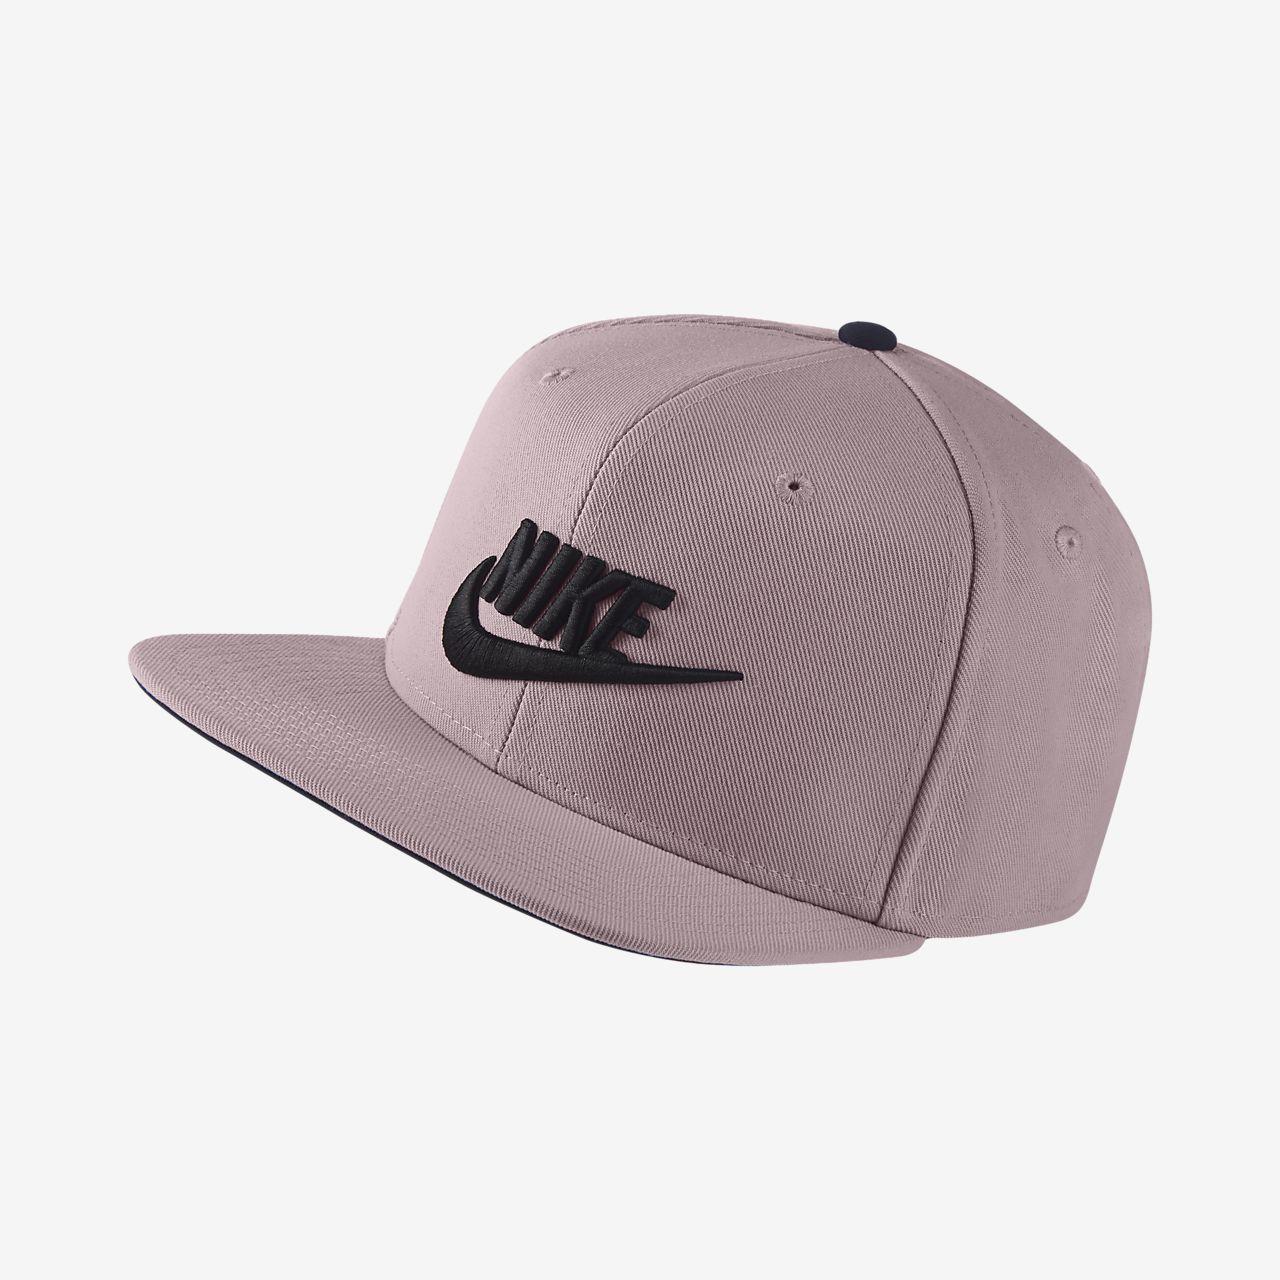 b193e31fb01 Nike Sportswear Pro Adjustable Hat. Nike.com BE